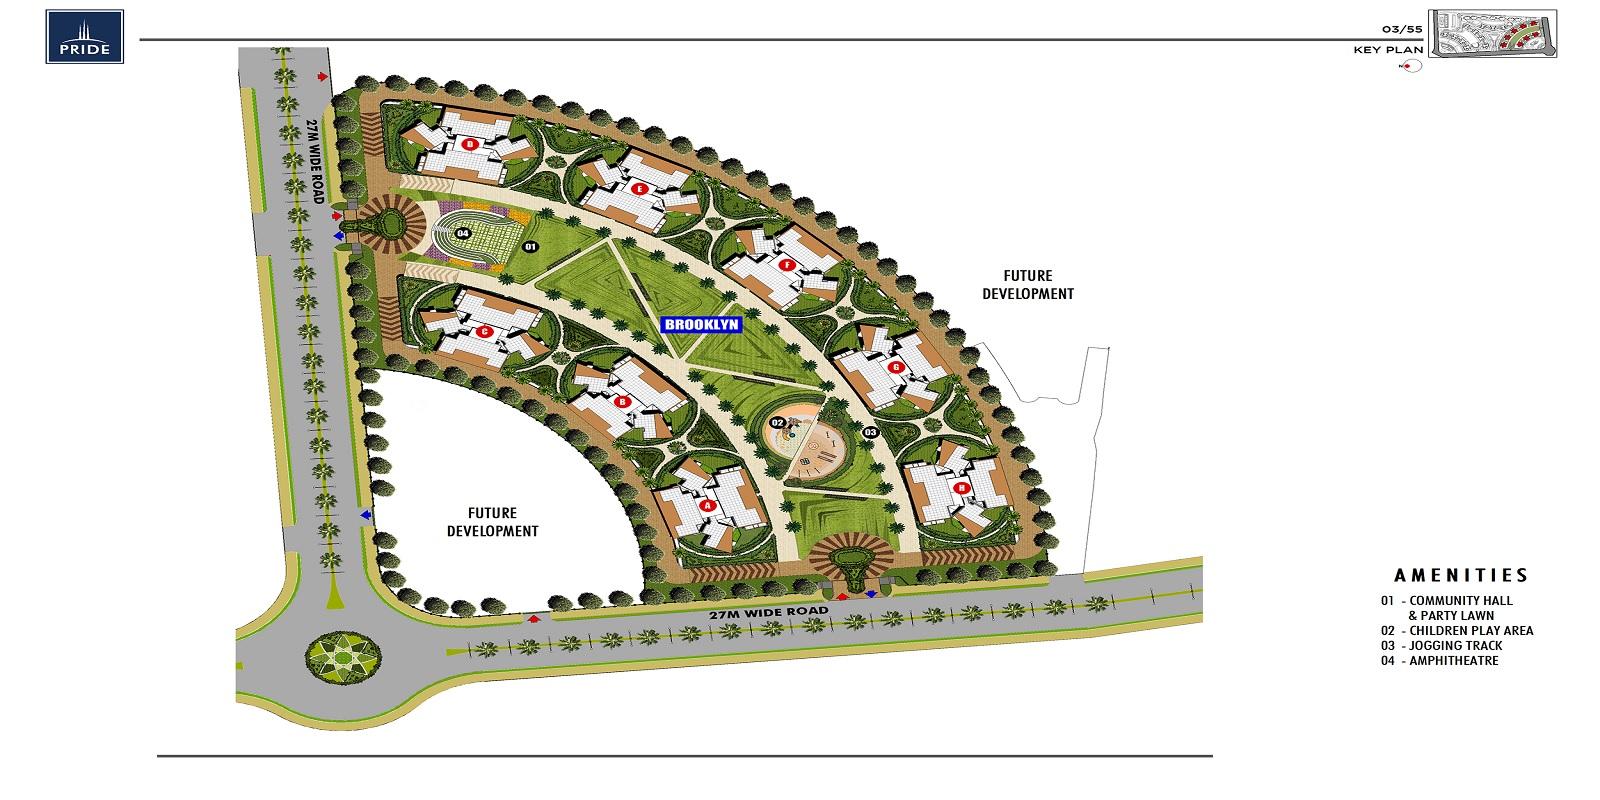 pride world city brooklyn project master plan image1